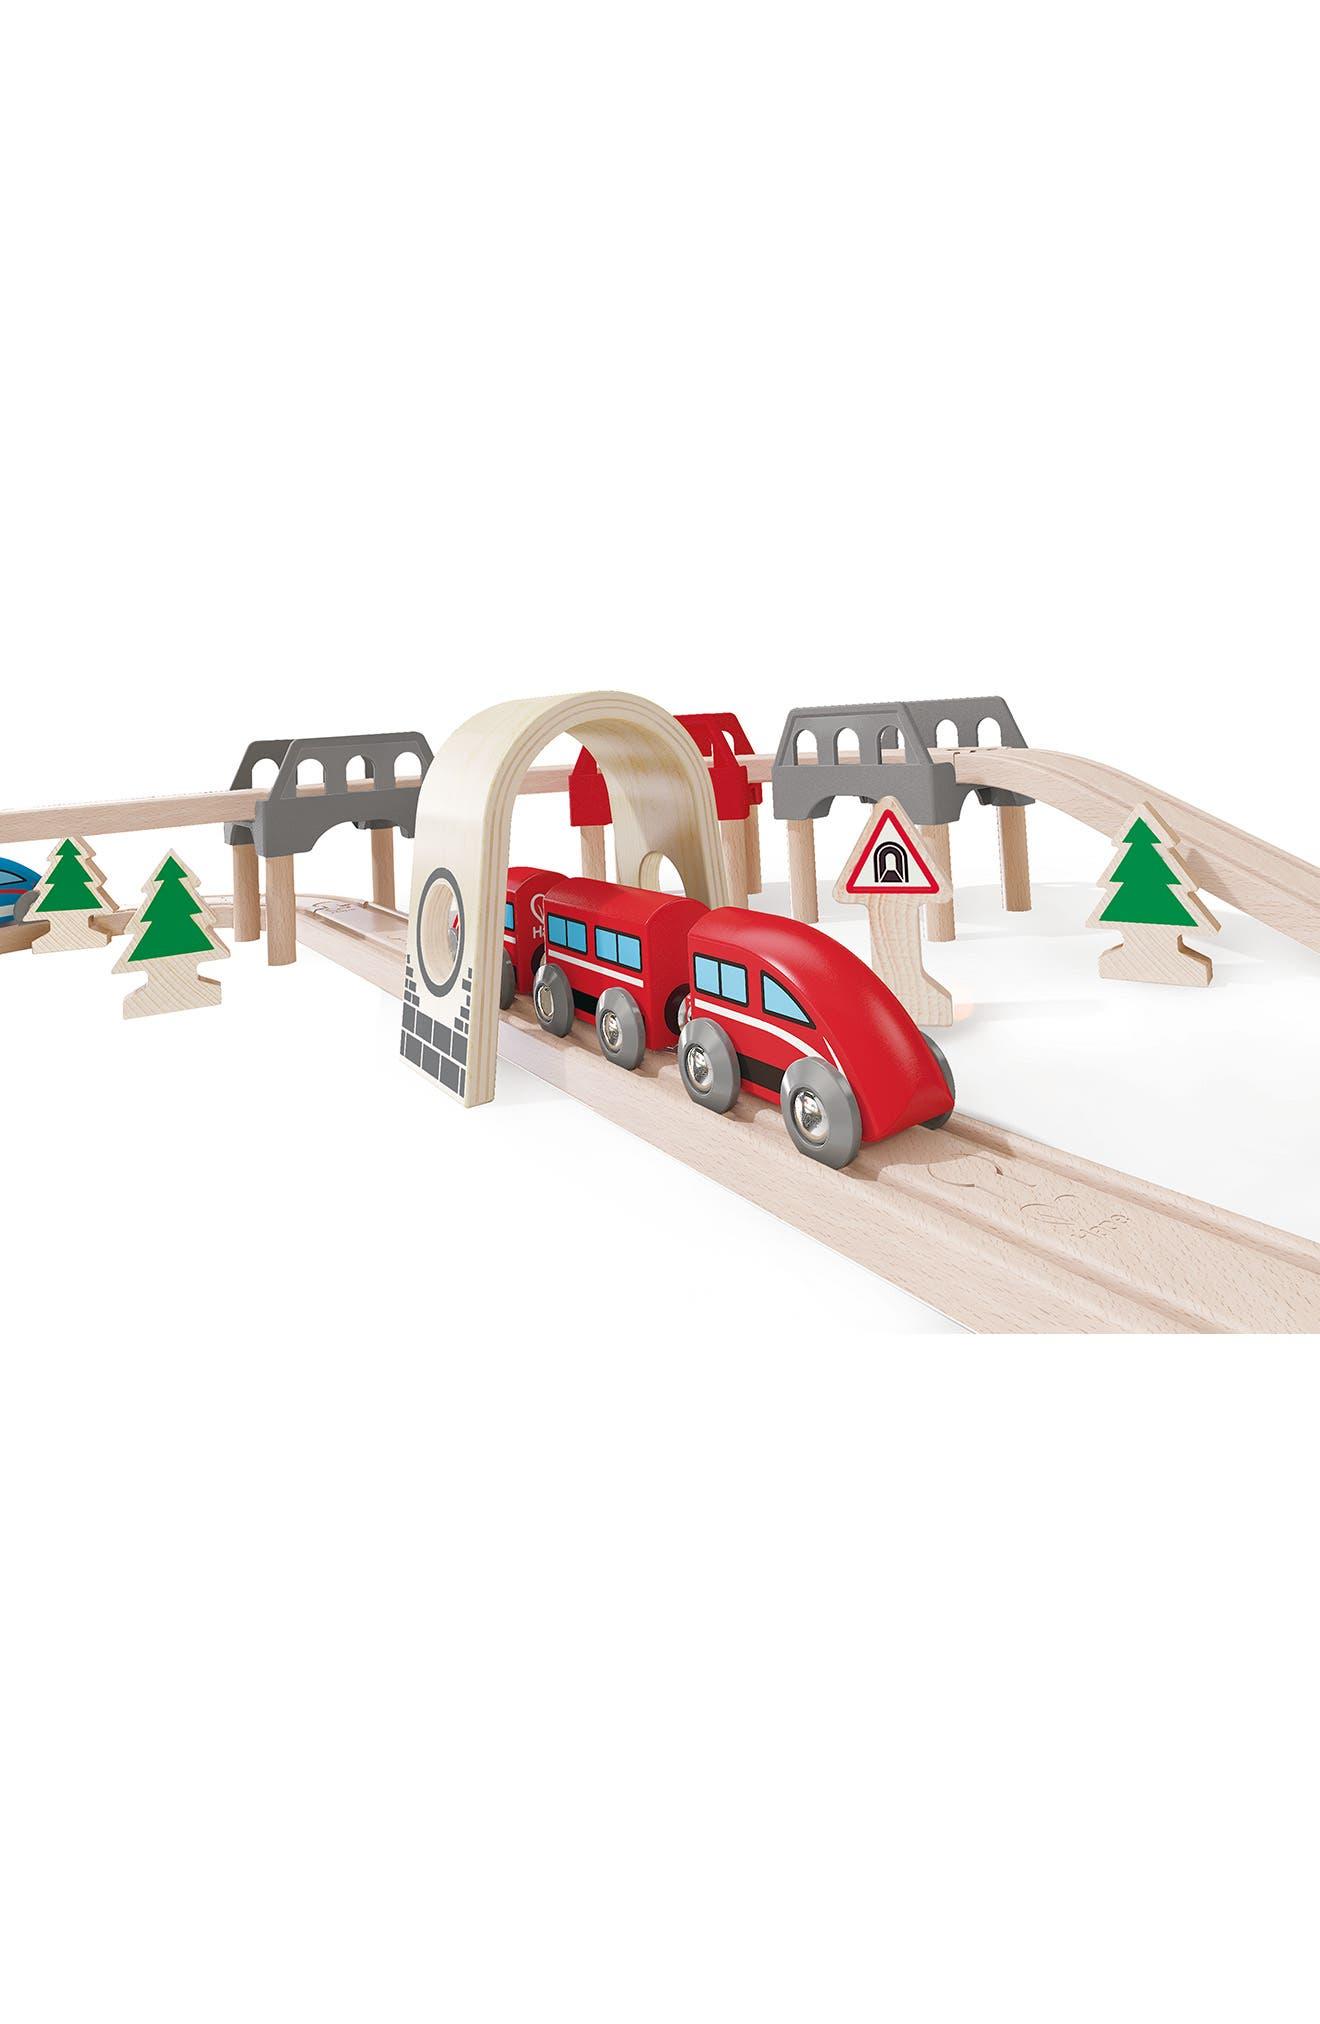 High & Low Railway Set,                             Alternate thumbnail 3, color,                             250